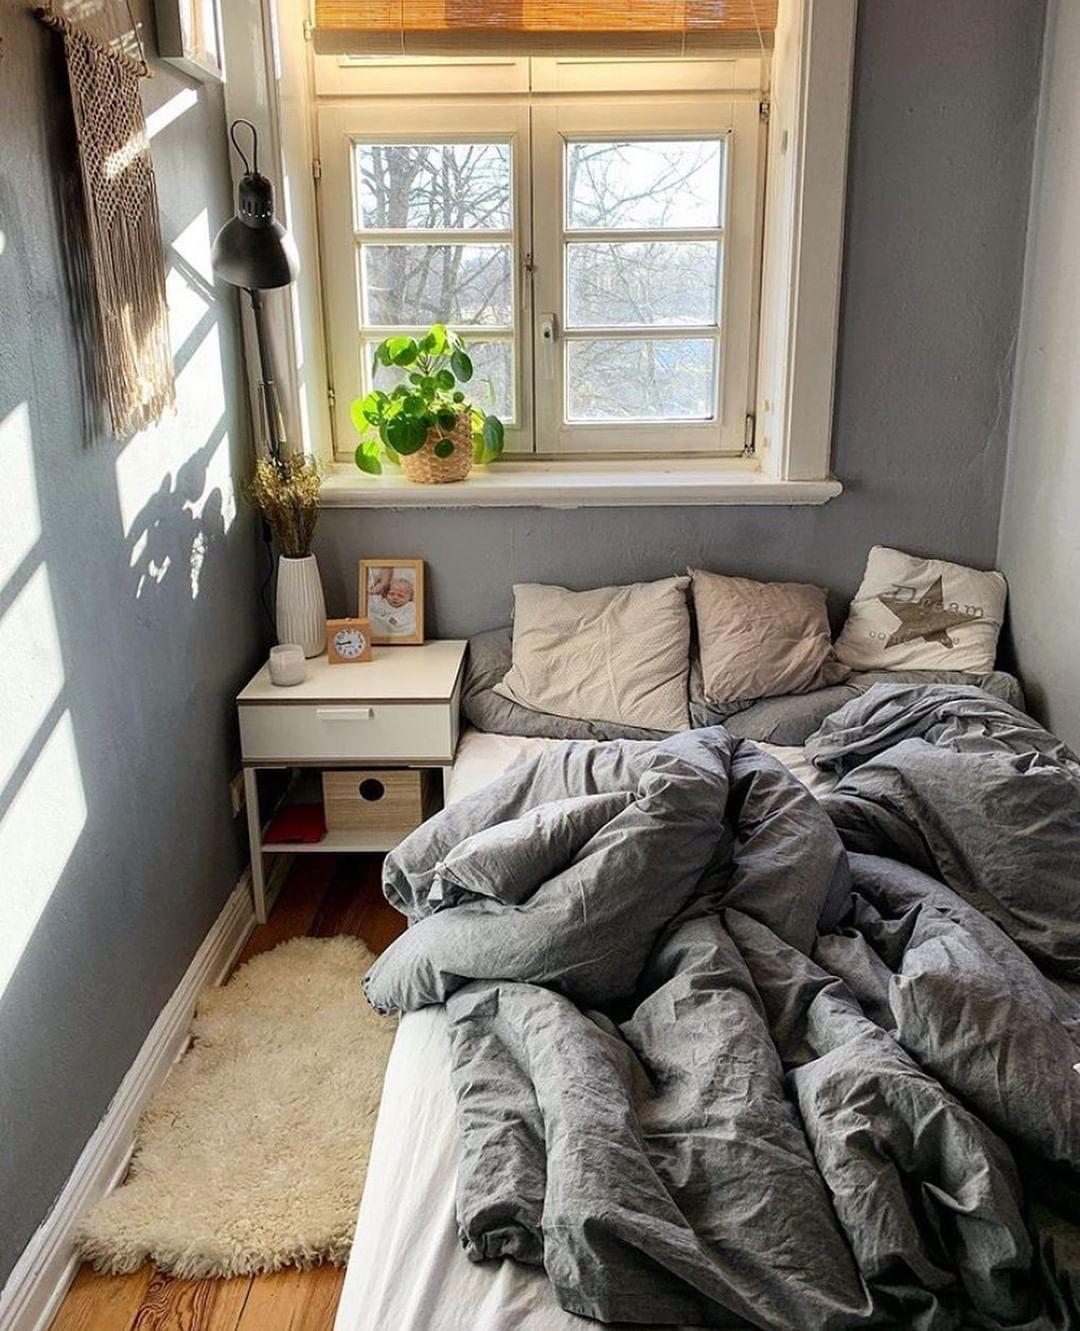 Home Design Ideas Instagram:  Home Decor On Instagram : More Inspo At @hippietribex